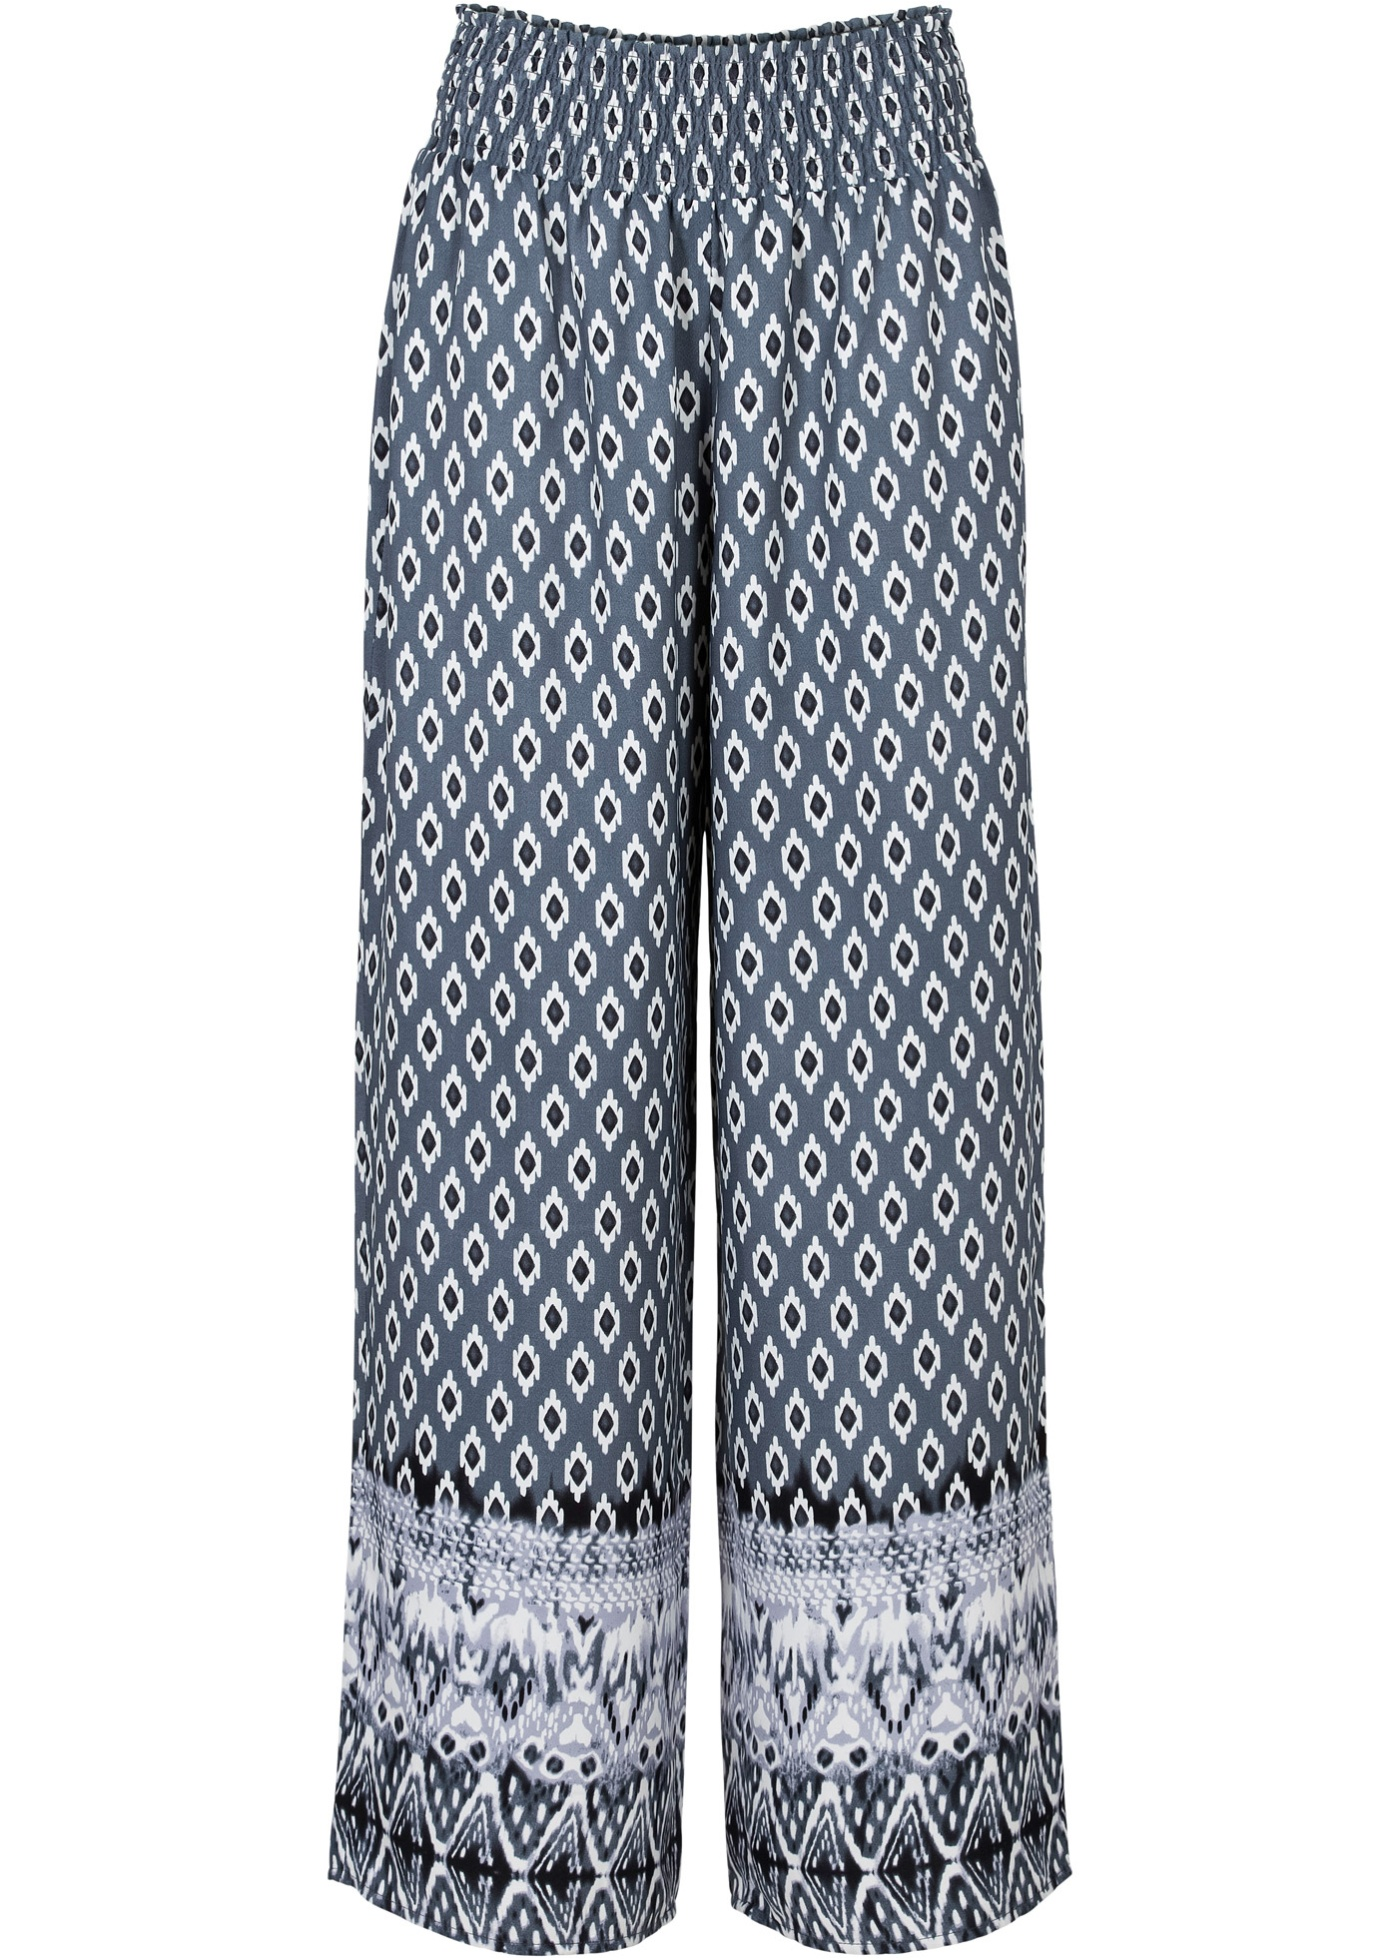 femme pantalon extra large jusqu 57 pureshopping. Black Bedroom Furniture Sets. Home Design Ideas